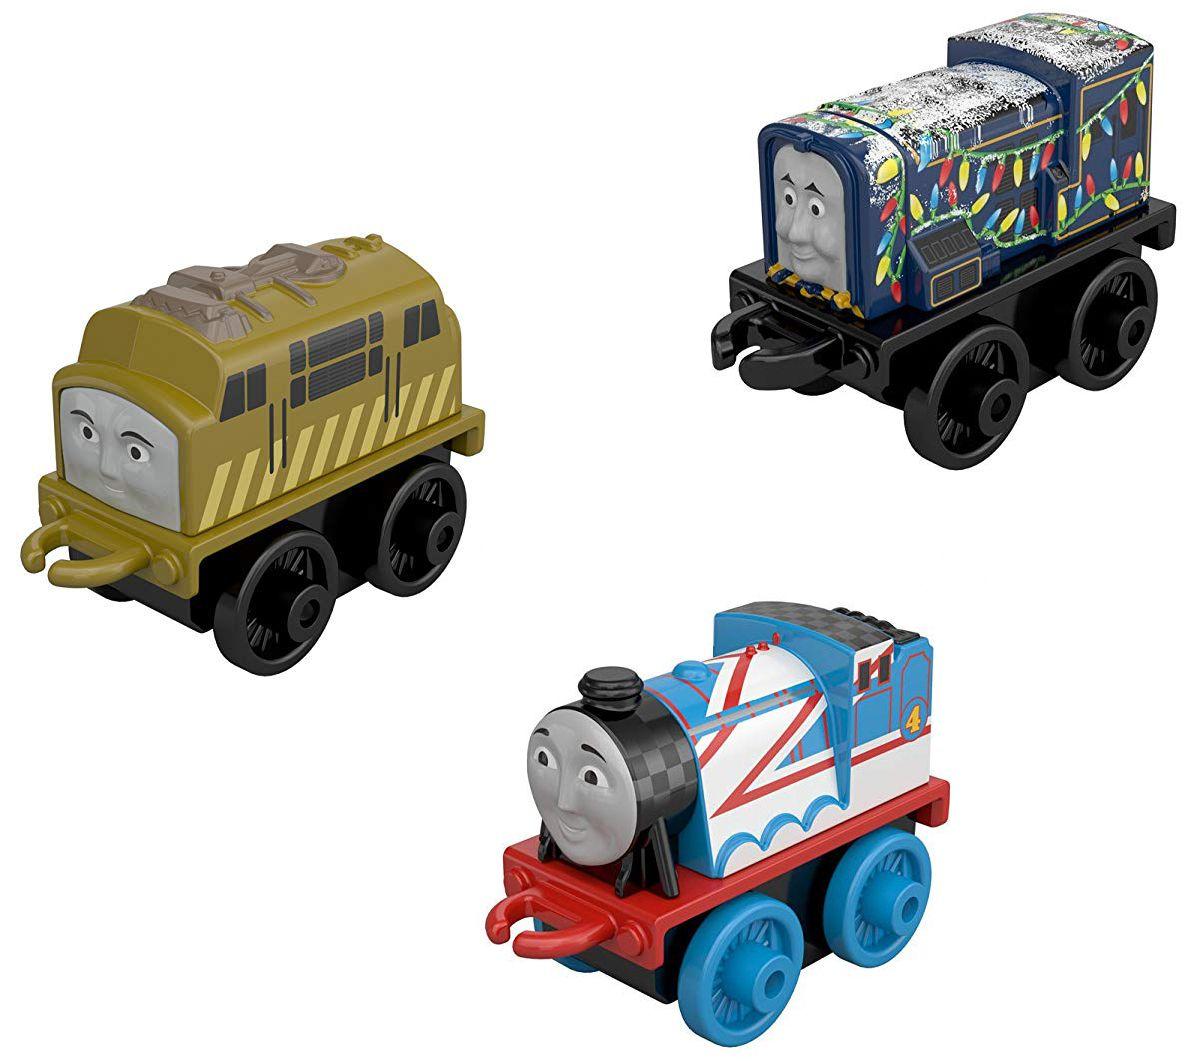 Комплект Fisher Price Thomas & Friends - Мини локомотиви, 3 броя, асортимент - 3